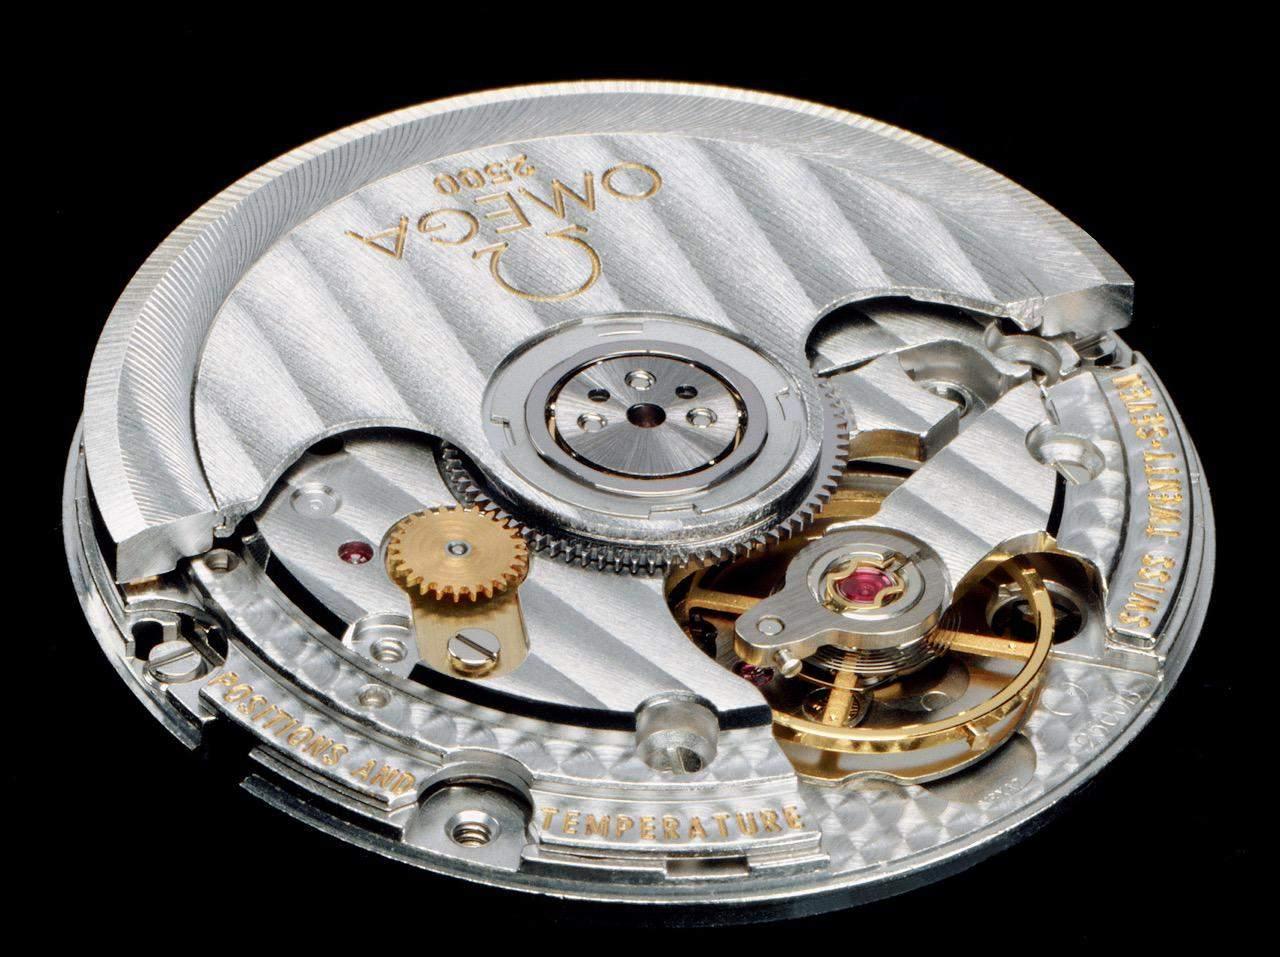 omega-co-axial-watch-movement-calibre-2500-06